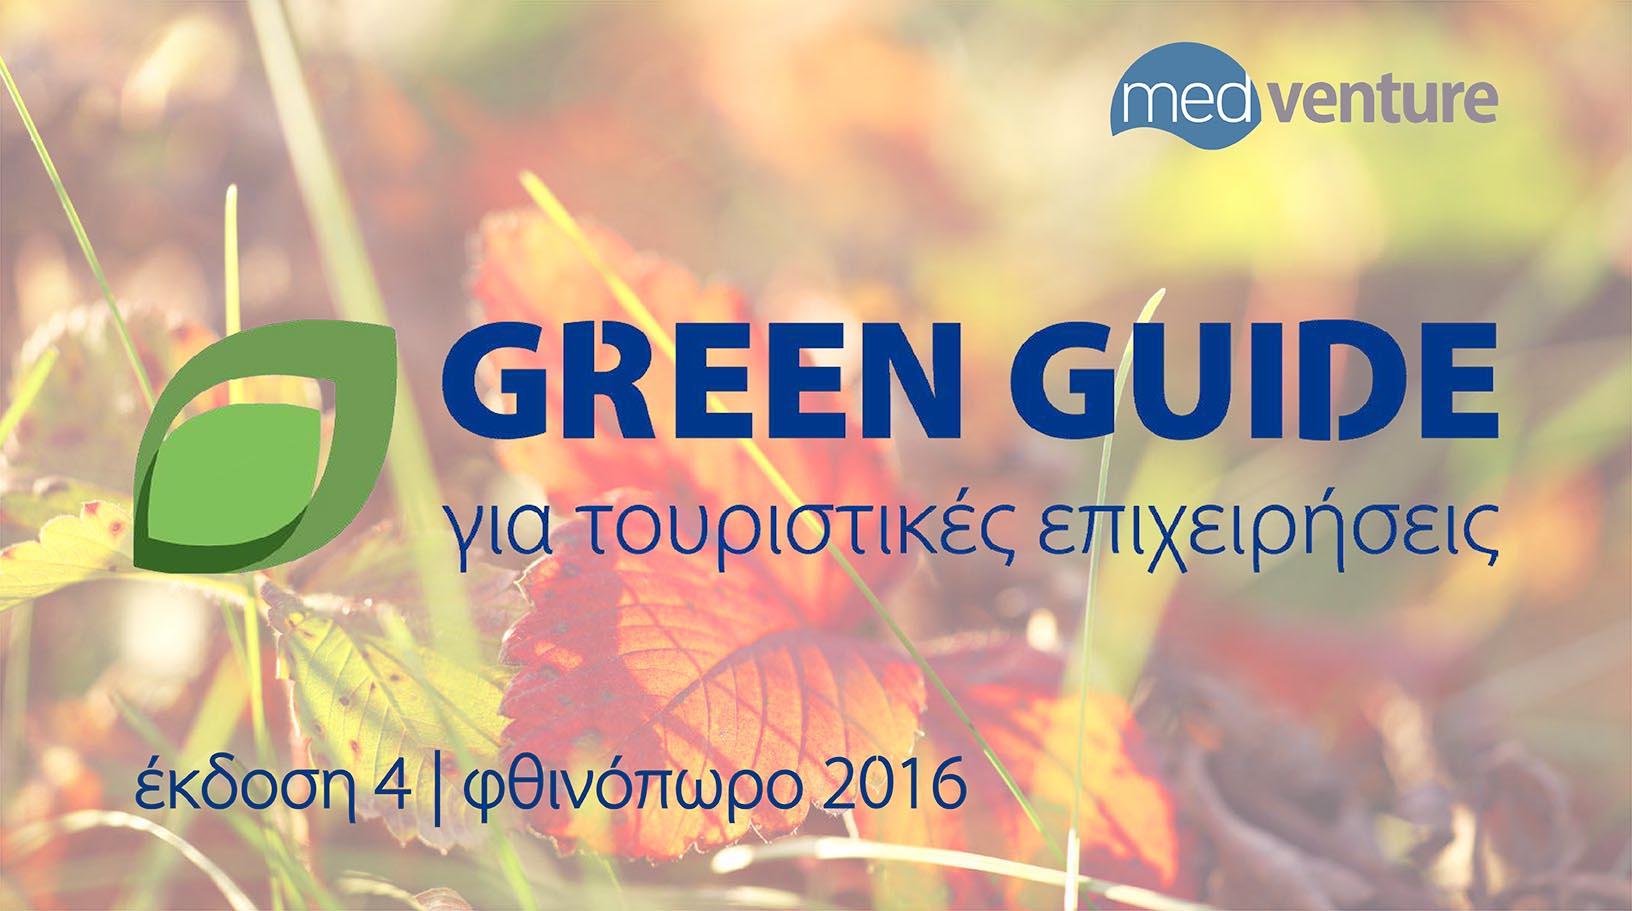 green guide 4 autumn